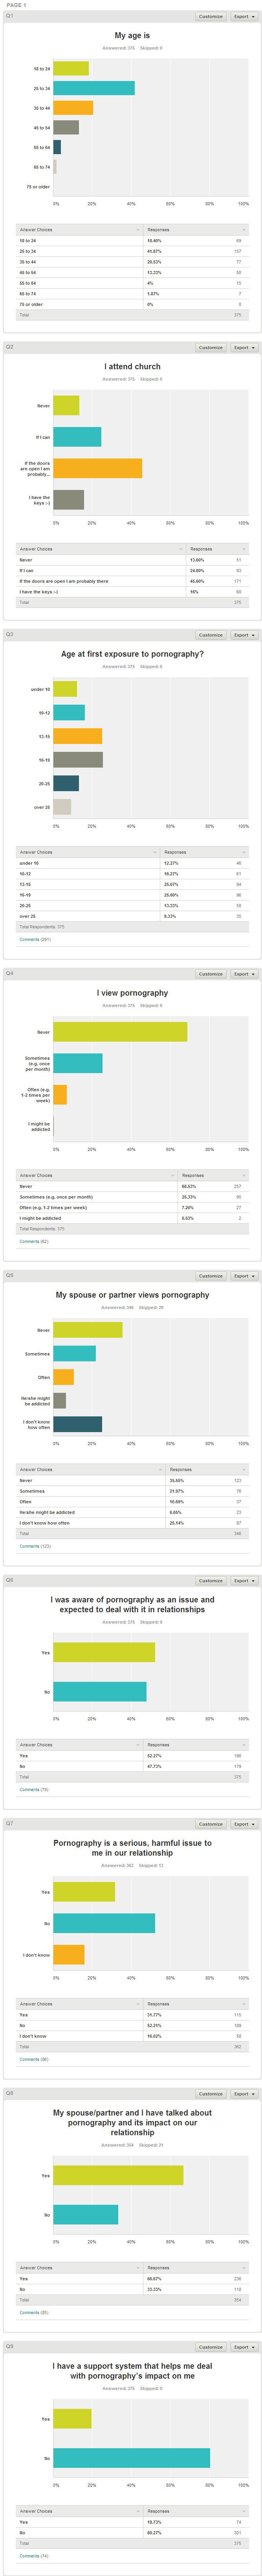 womens survey results.jpg